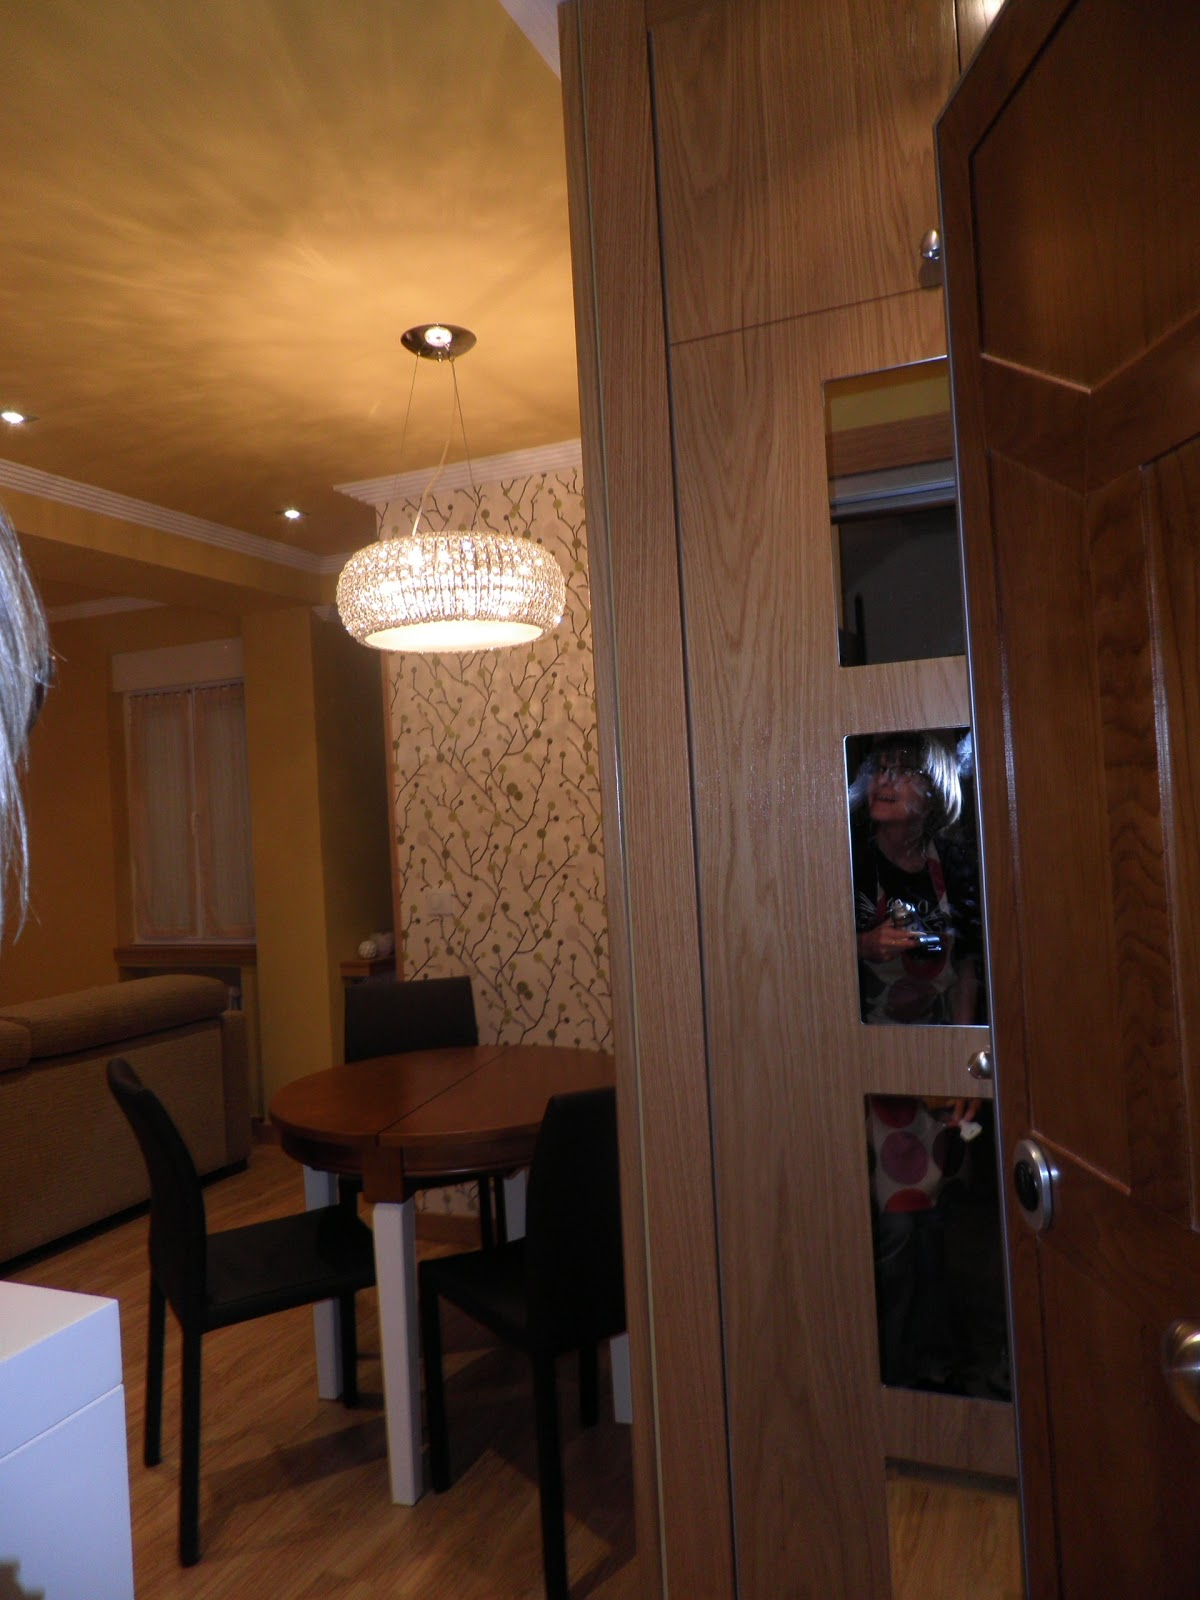 Interiorismo y decoracion lola torga espacios peque os for Comedor para espacios pequea os